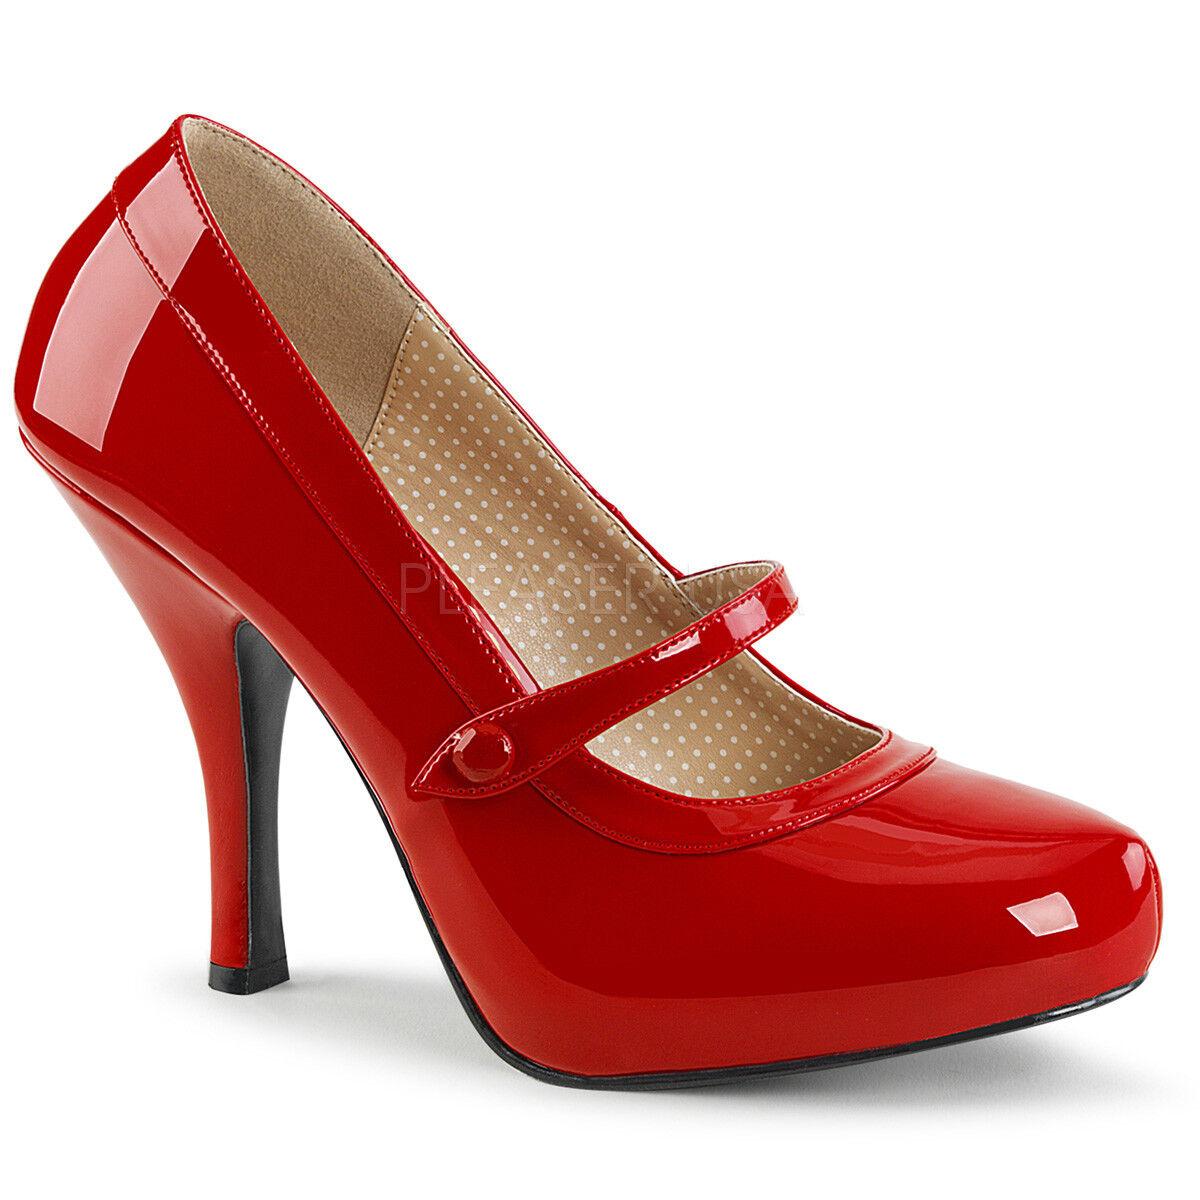 Pleaser PINUP-01 damen rot Patent Hidden Platform Maryjane Pump Heel schuhe